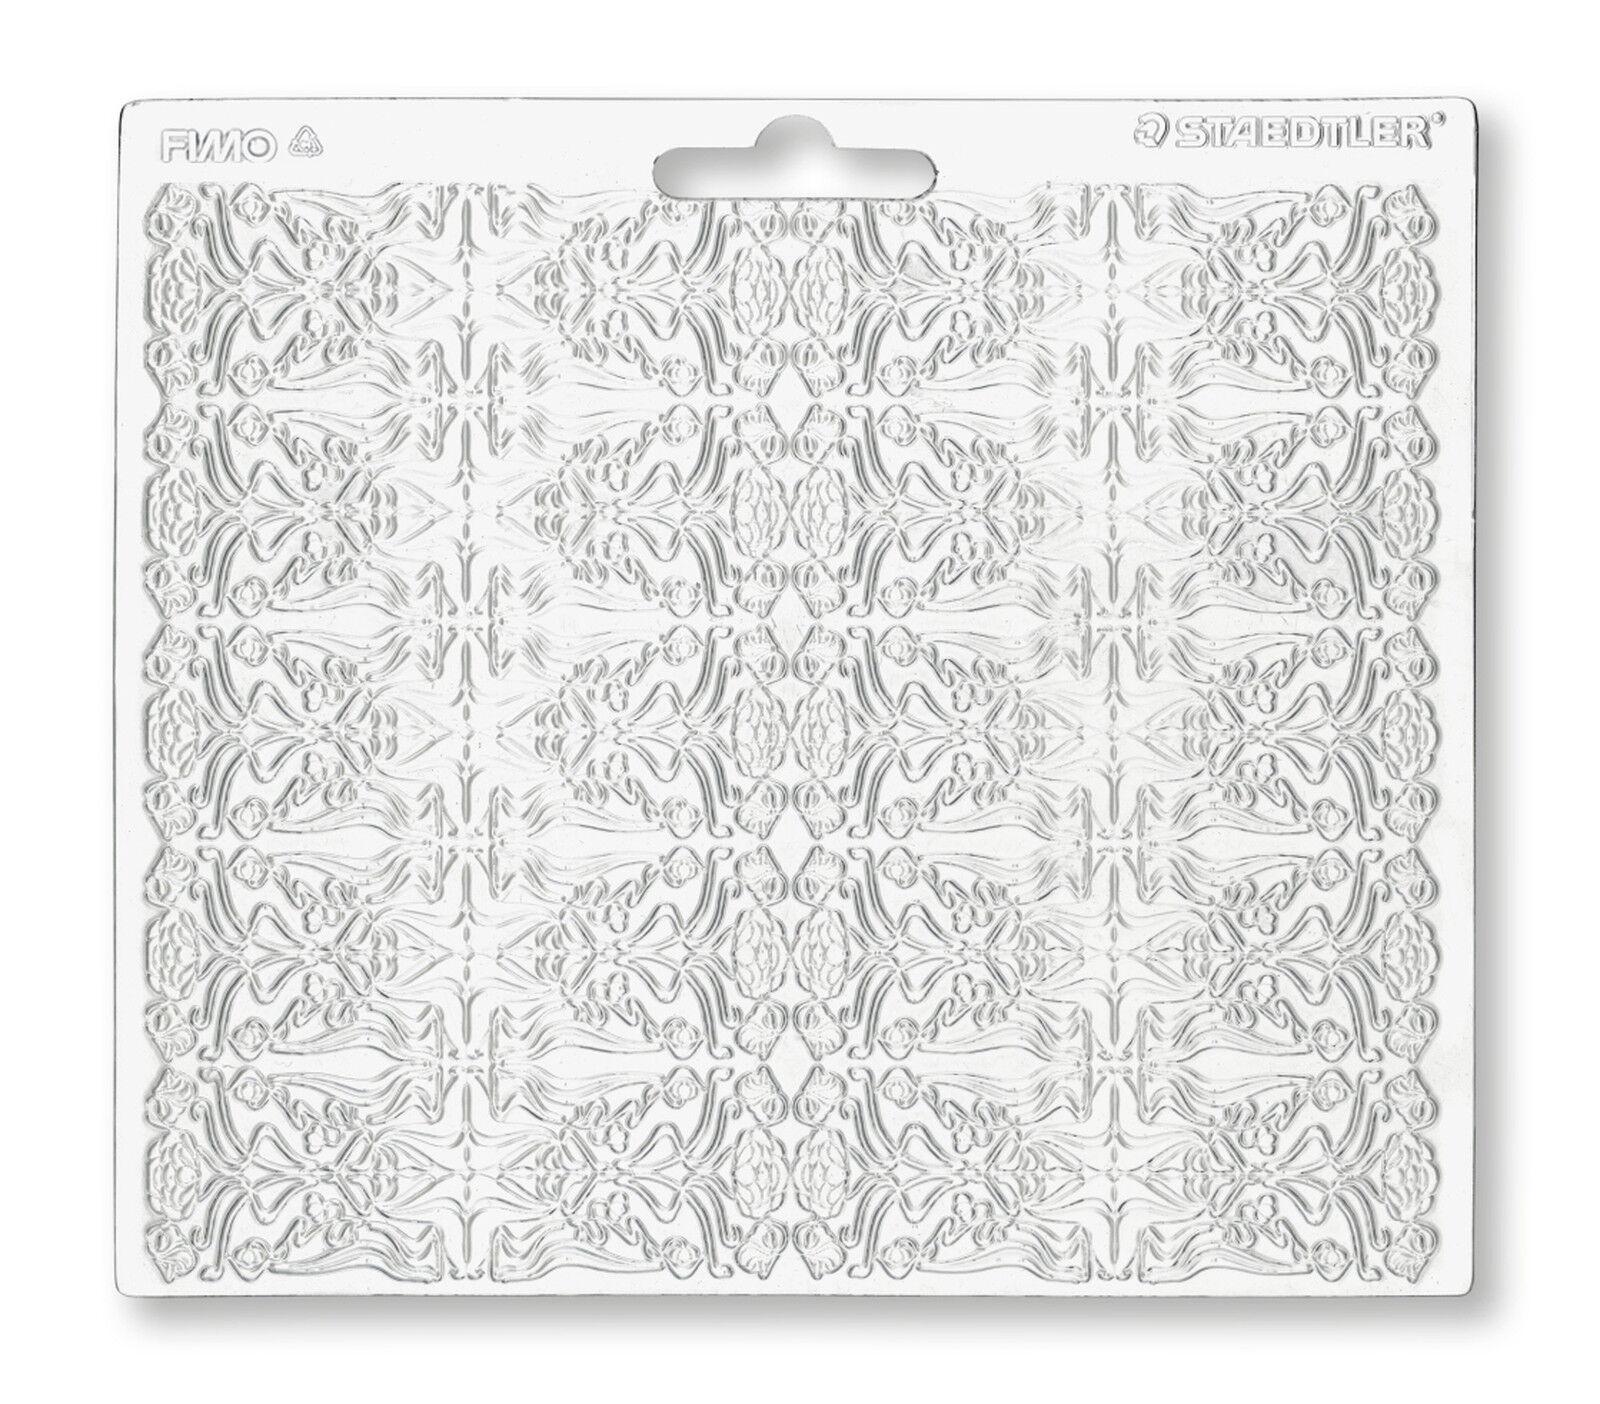 Staedtler Fimo Unique Baroque Texture Feuille tumdee Craft Art Fun 16.7 cm x 14 cm